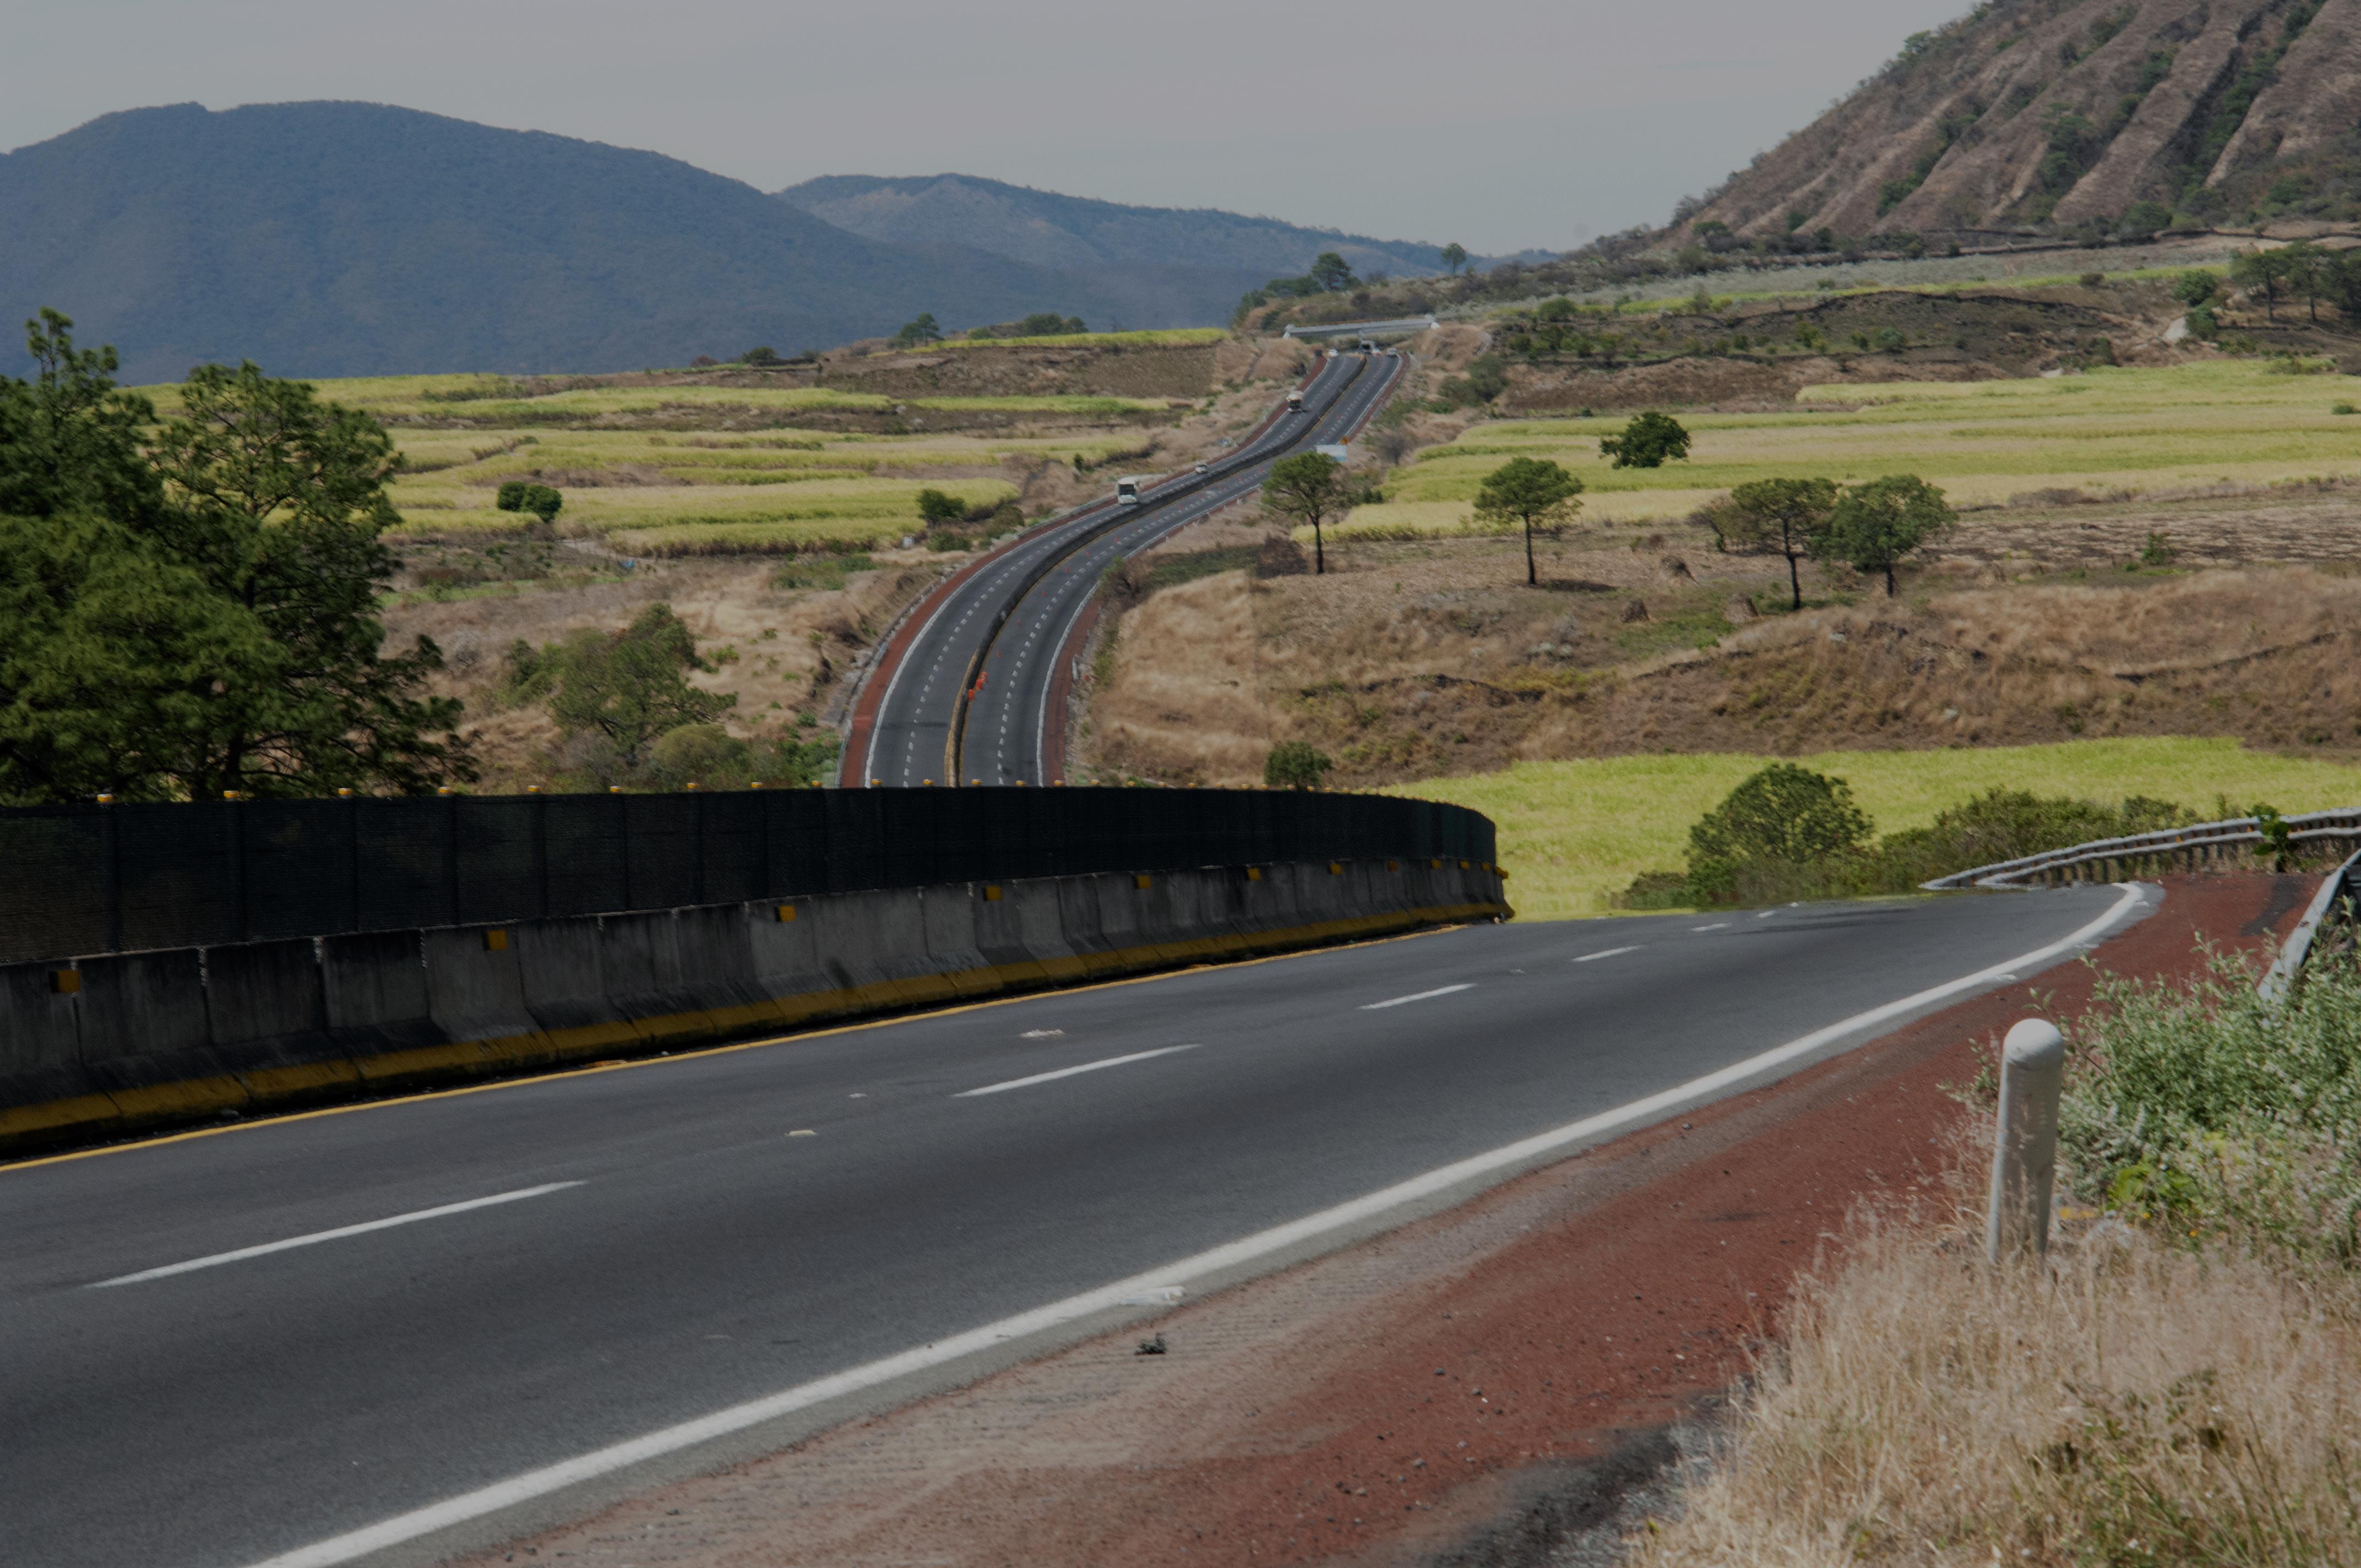 Bienvenidos a ciaO | Expertos en Operación Carretera